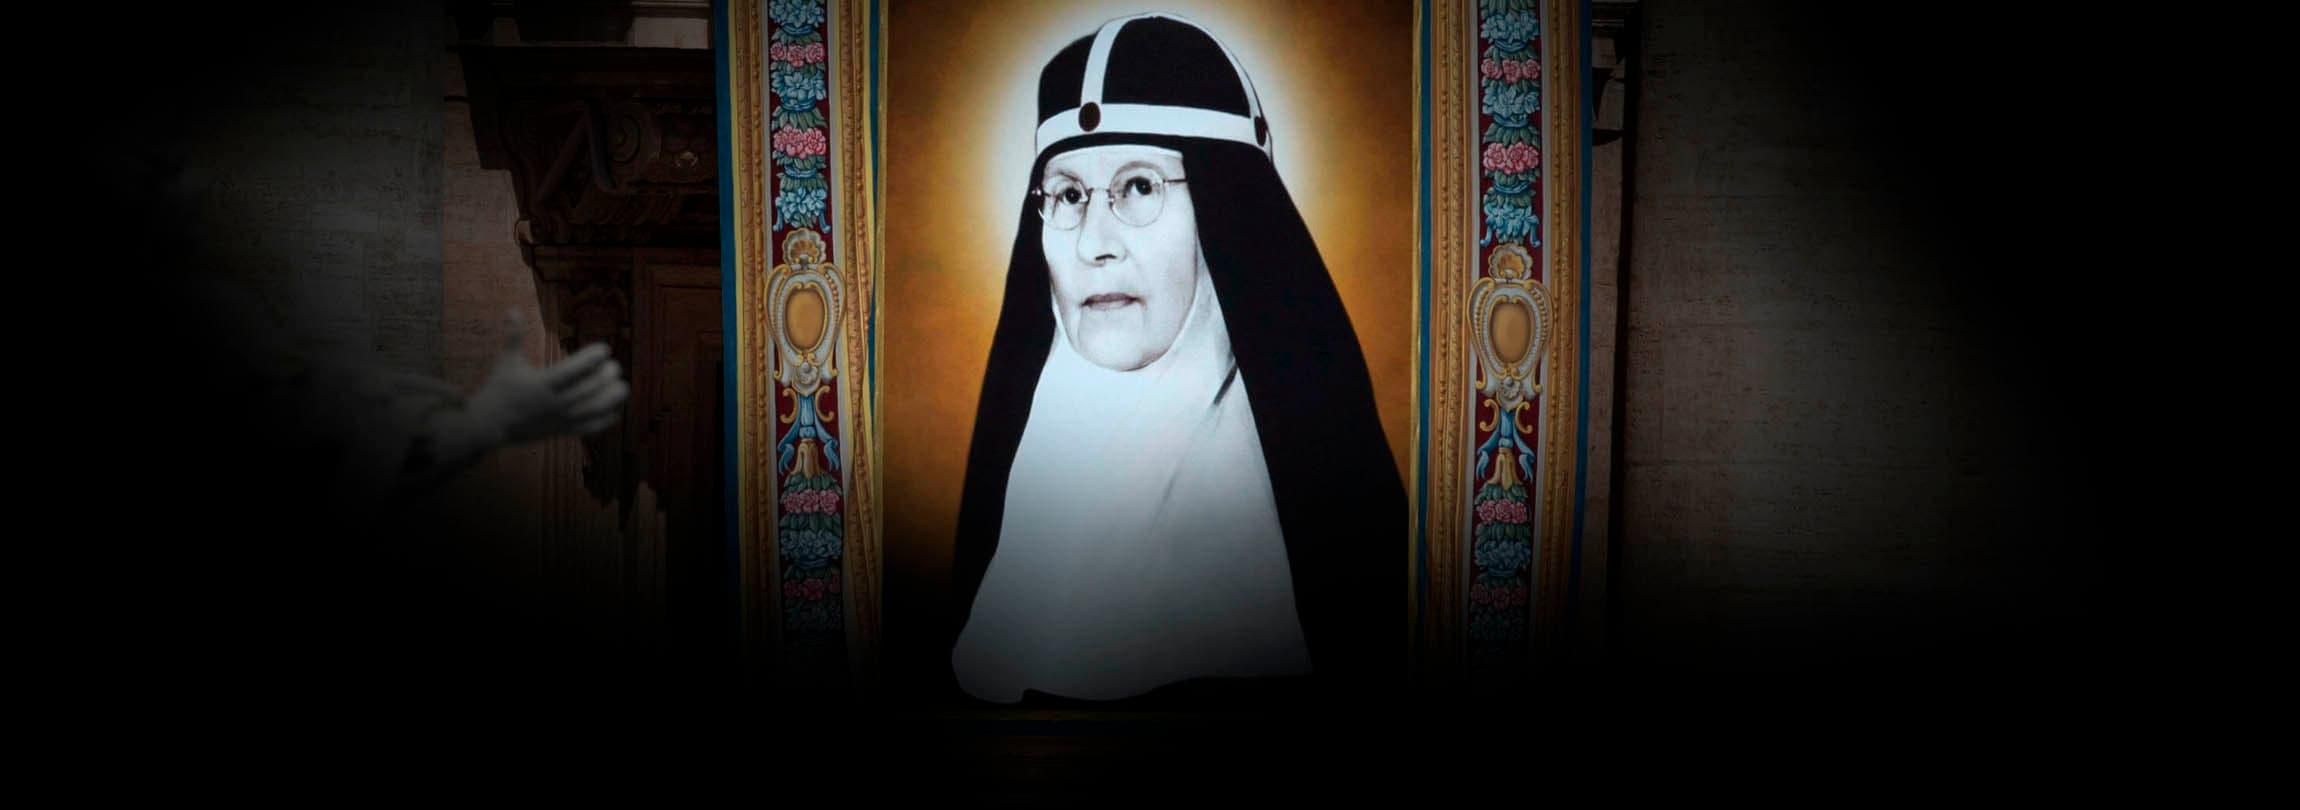 Ex-luterana convertida à Igreja é declarada santa pelo Papa Francisco